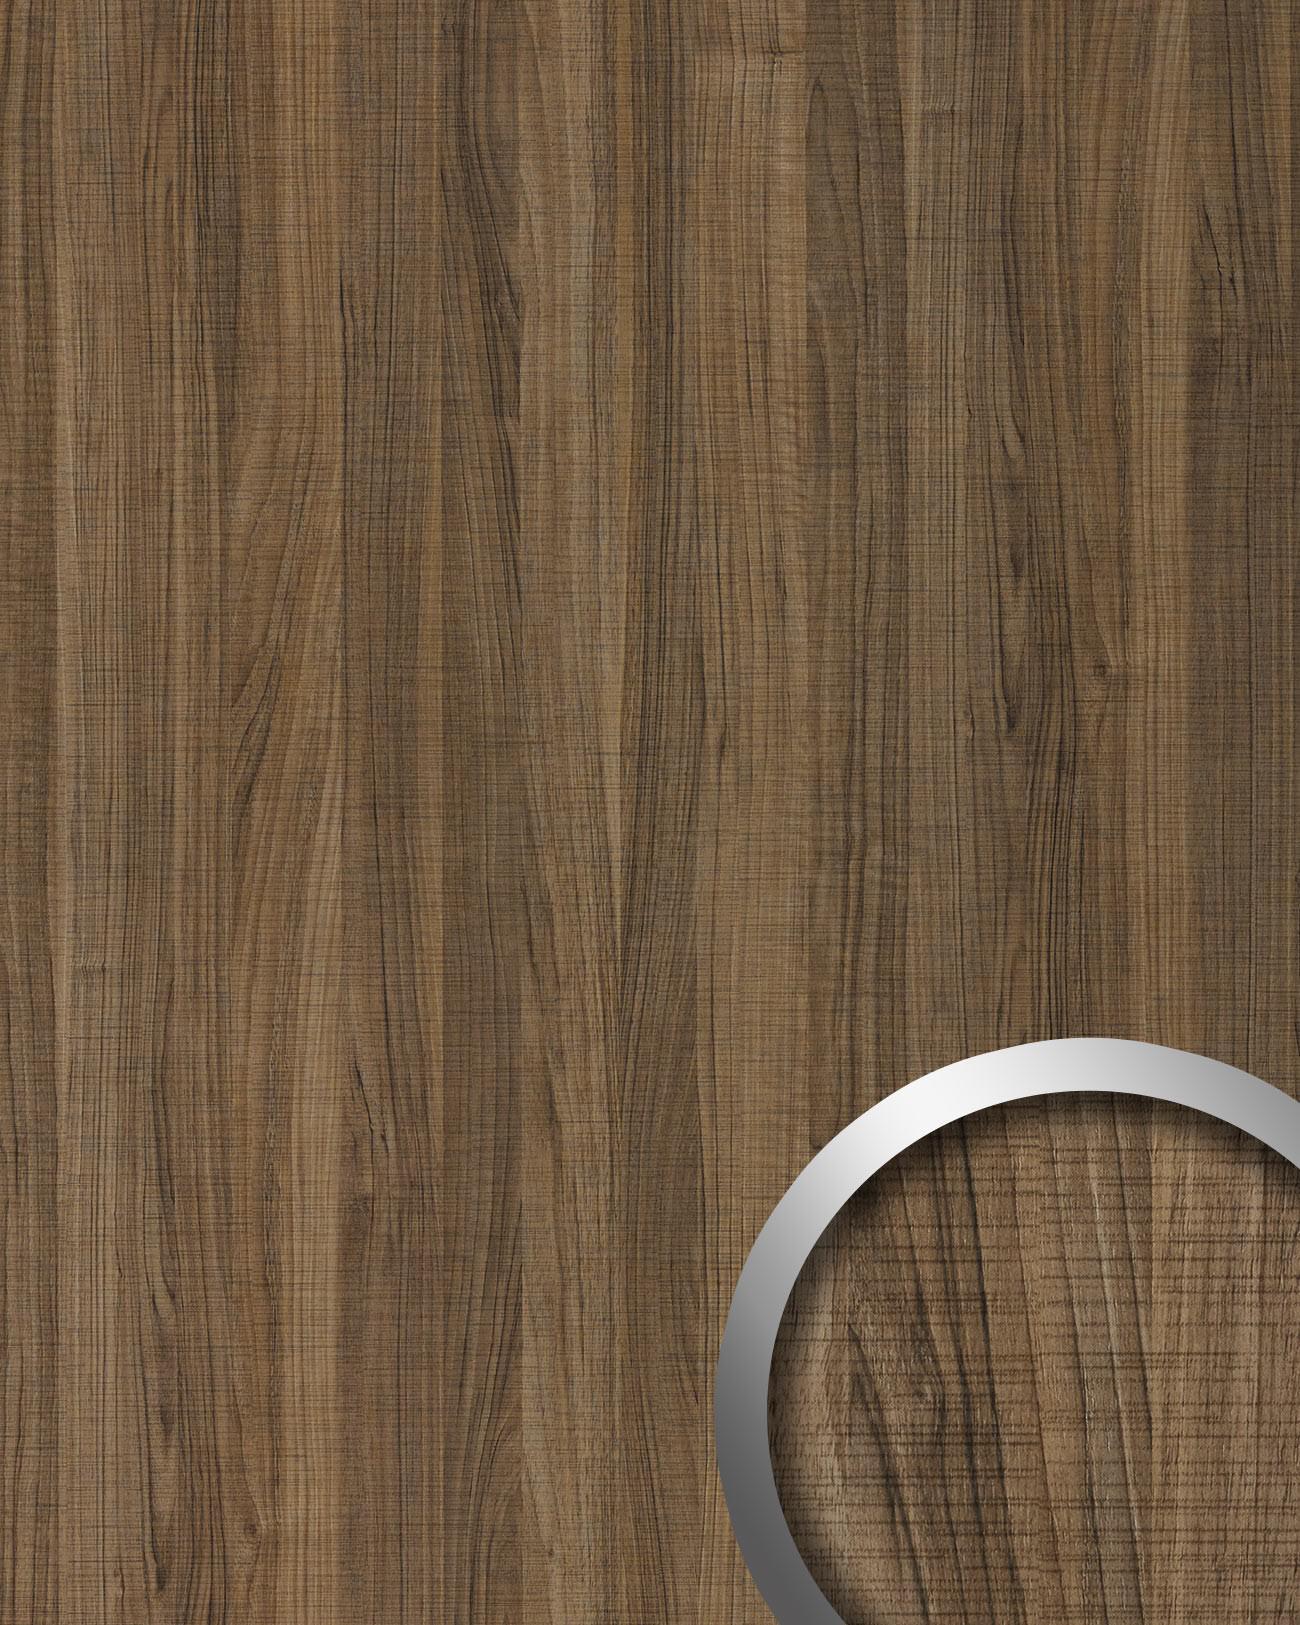 wandpaneel holz optik wallface 19028 nutwood country nussbaum holzdekor naturgetreue haptik. Black Bedroom Furniture Sets. Home Design Ideas